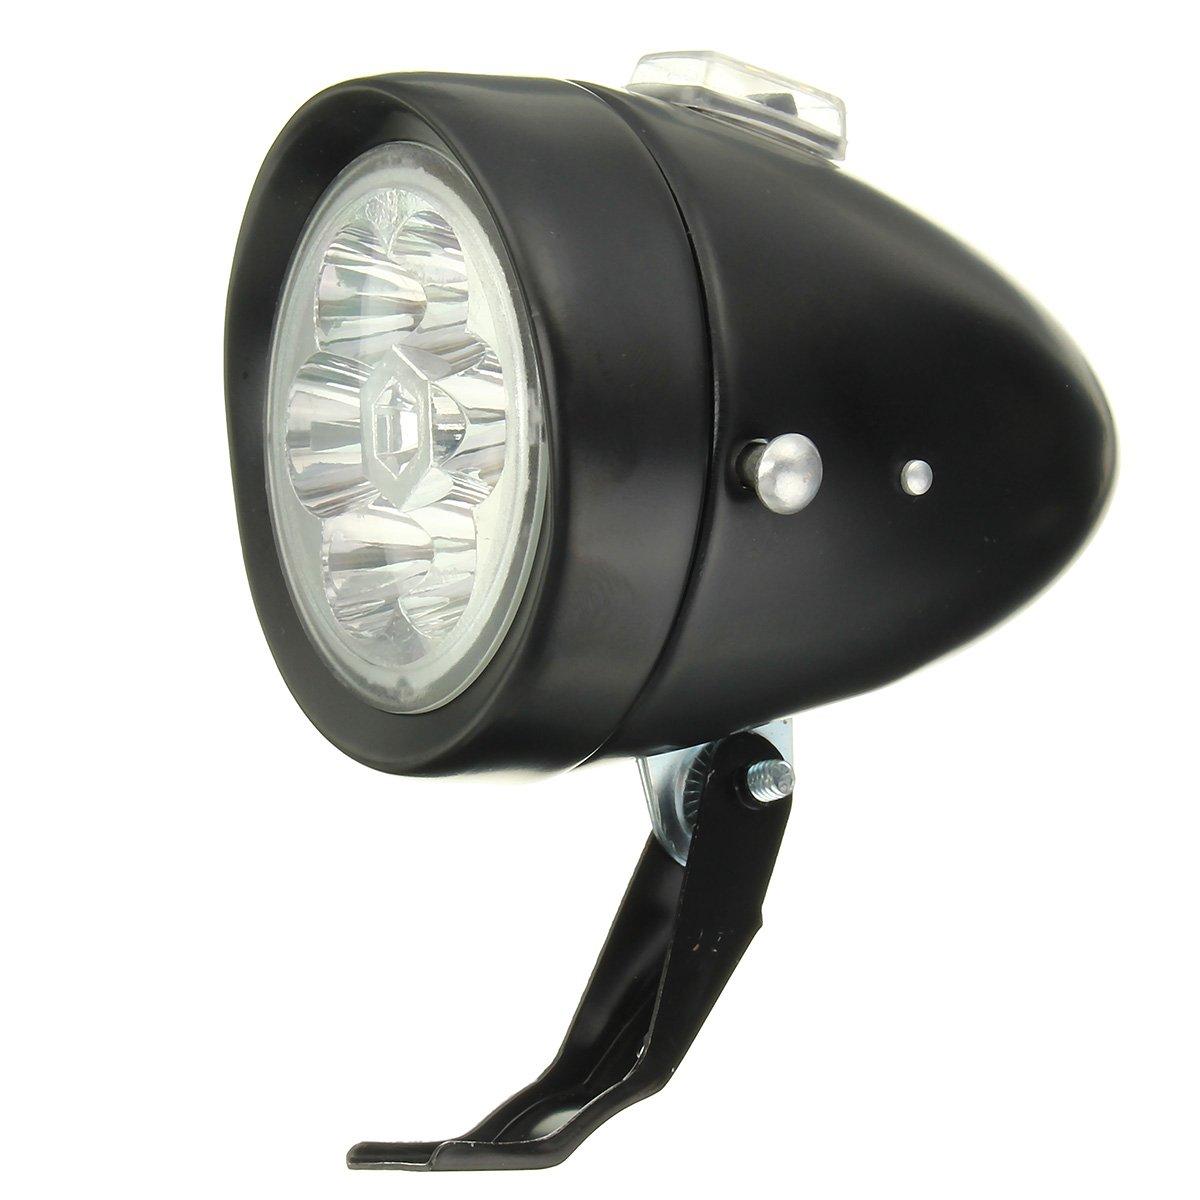 Alamor Retro Vintage E-Bike Bike Front Light Led Headlight Head Antiniebla Con Soporte-Negro